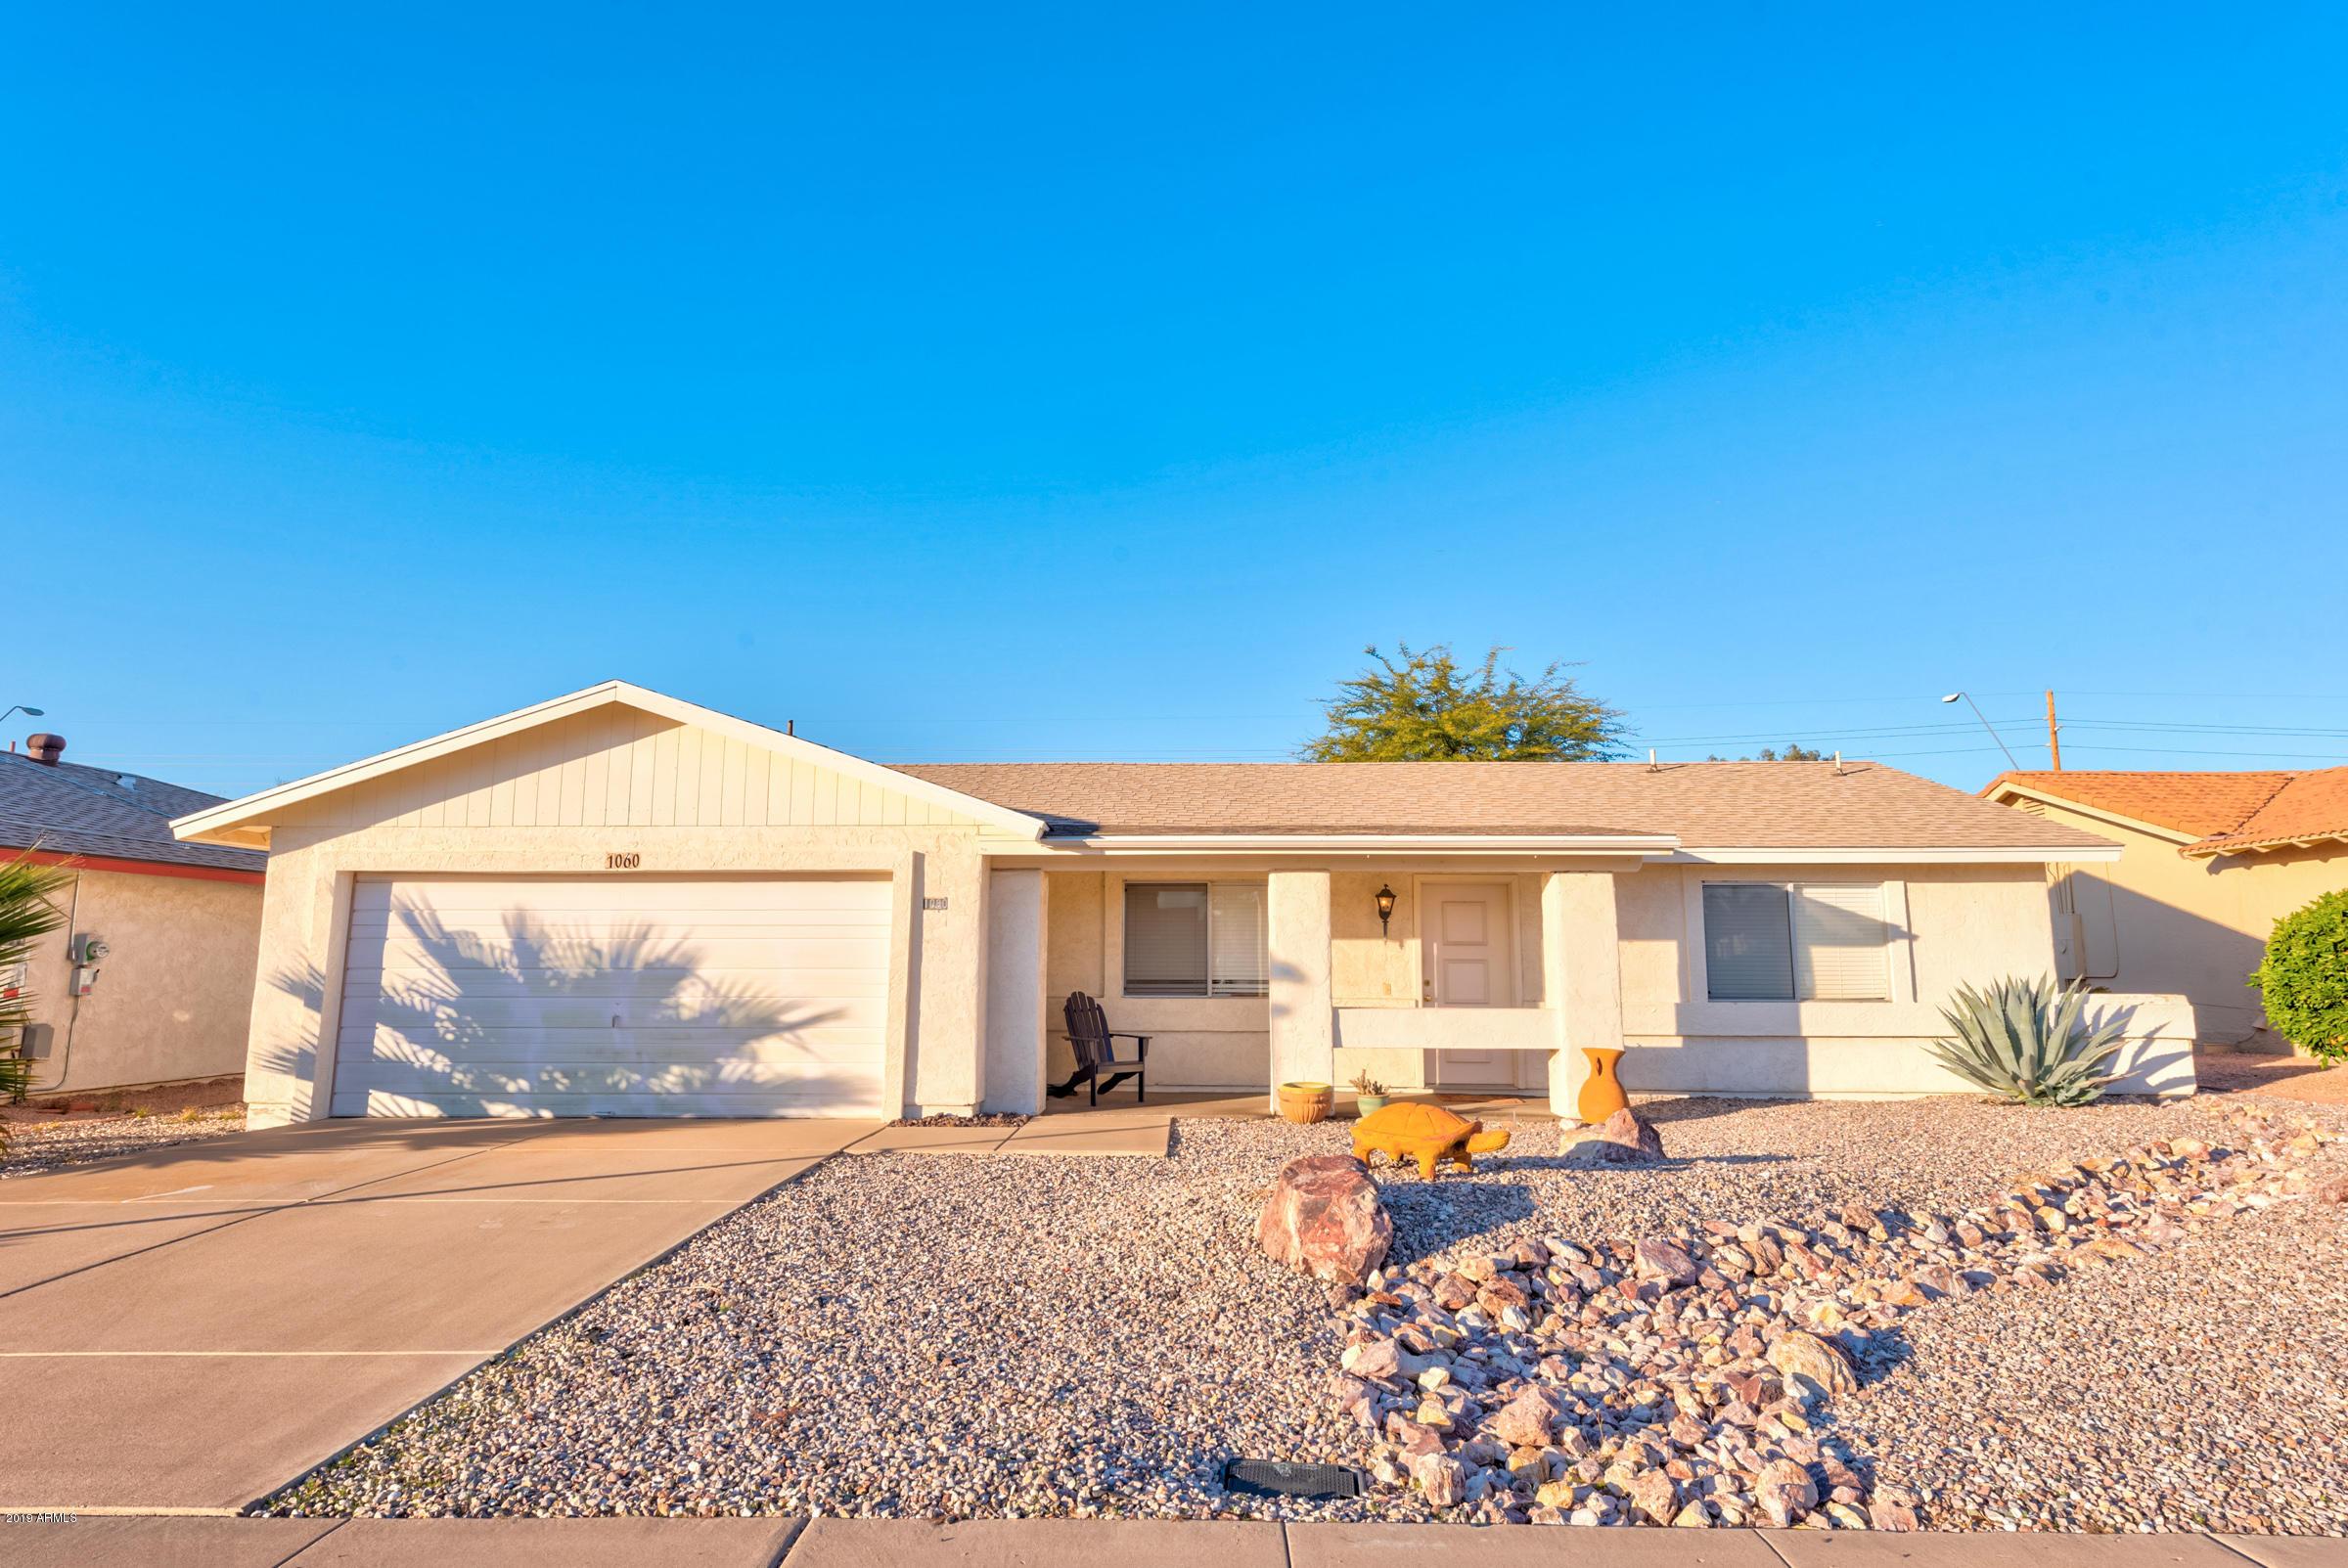 Photo of 1060 LEISURE WORLD --, Mesa, AZ 85206